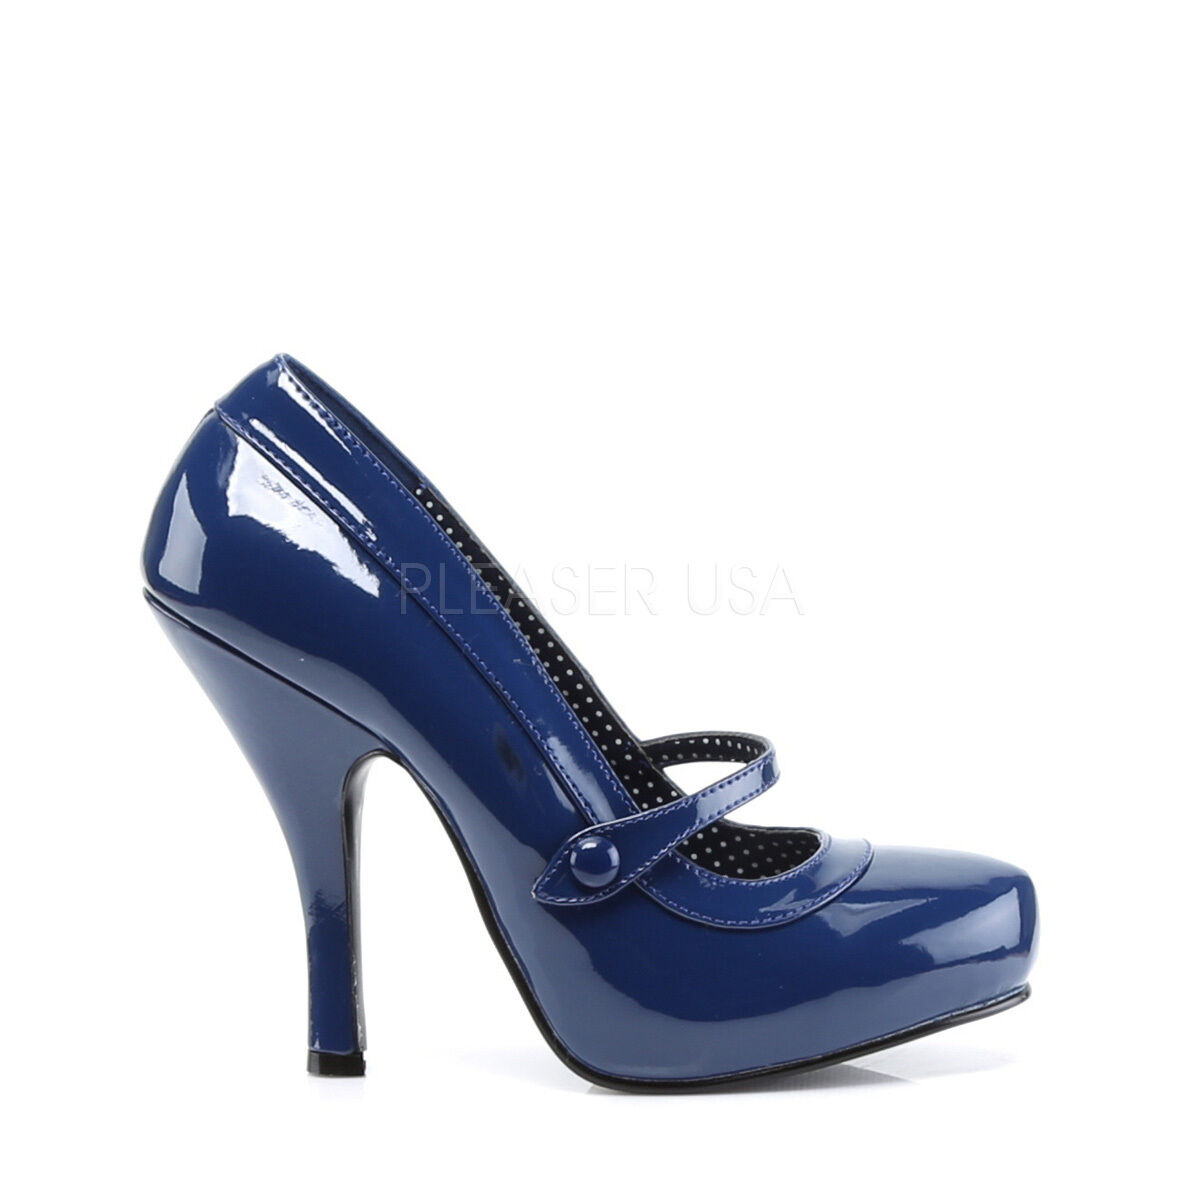 PINUP CUTIE02 NBPT Retro Retro Retro Vintage Style Navy bluee Mary Janes High Heels shoes 47bab4